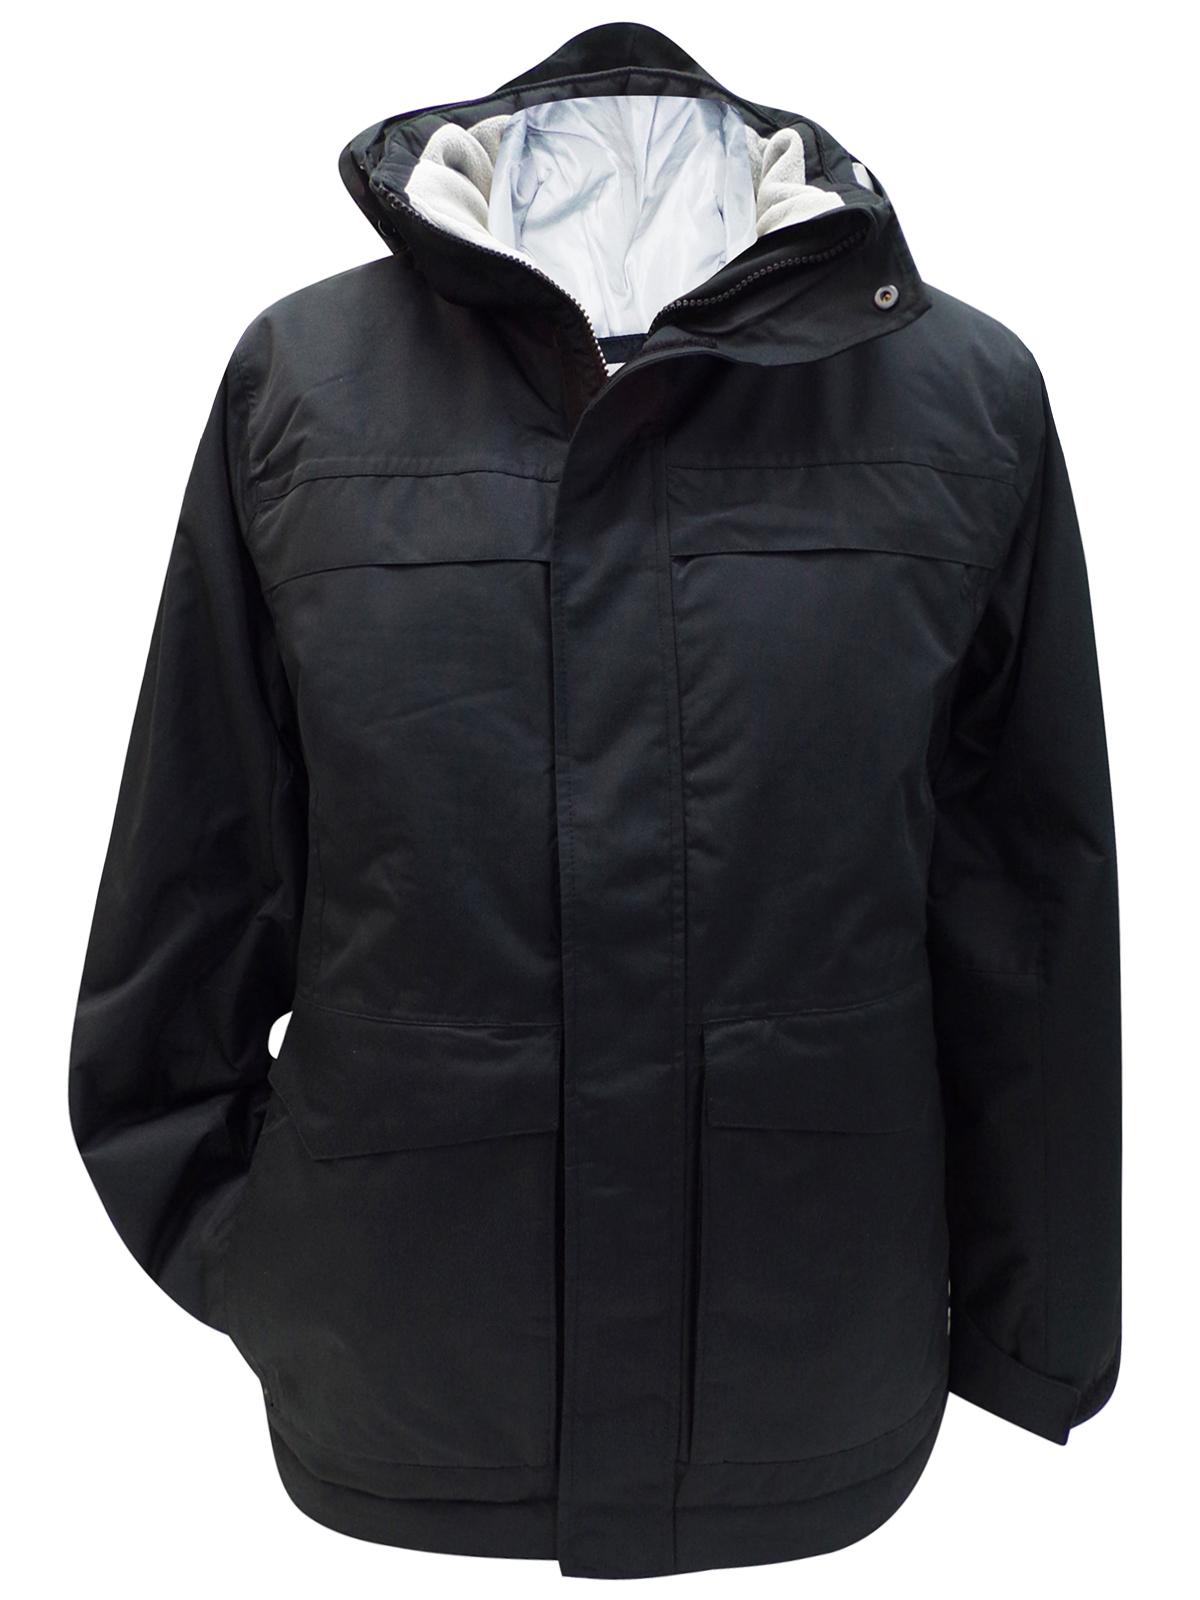 Athletic Works - - Athletic Works Black Panelled Detachable Hood Jacket -7727